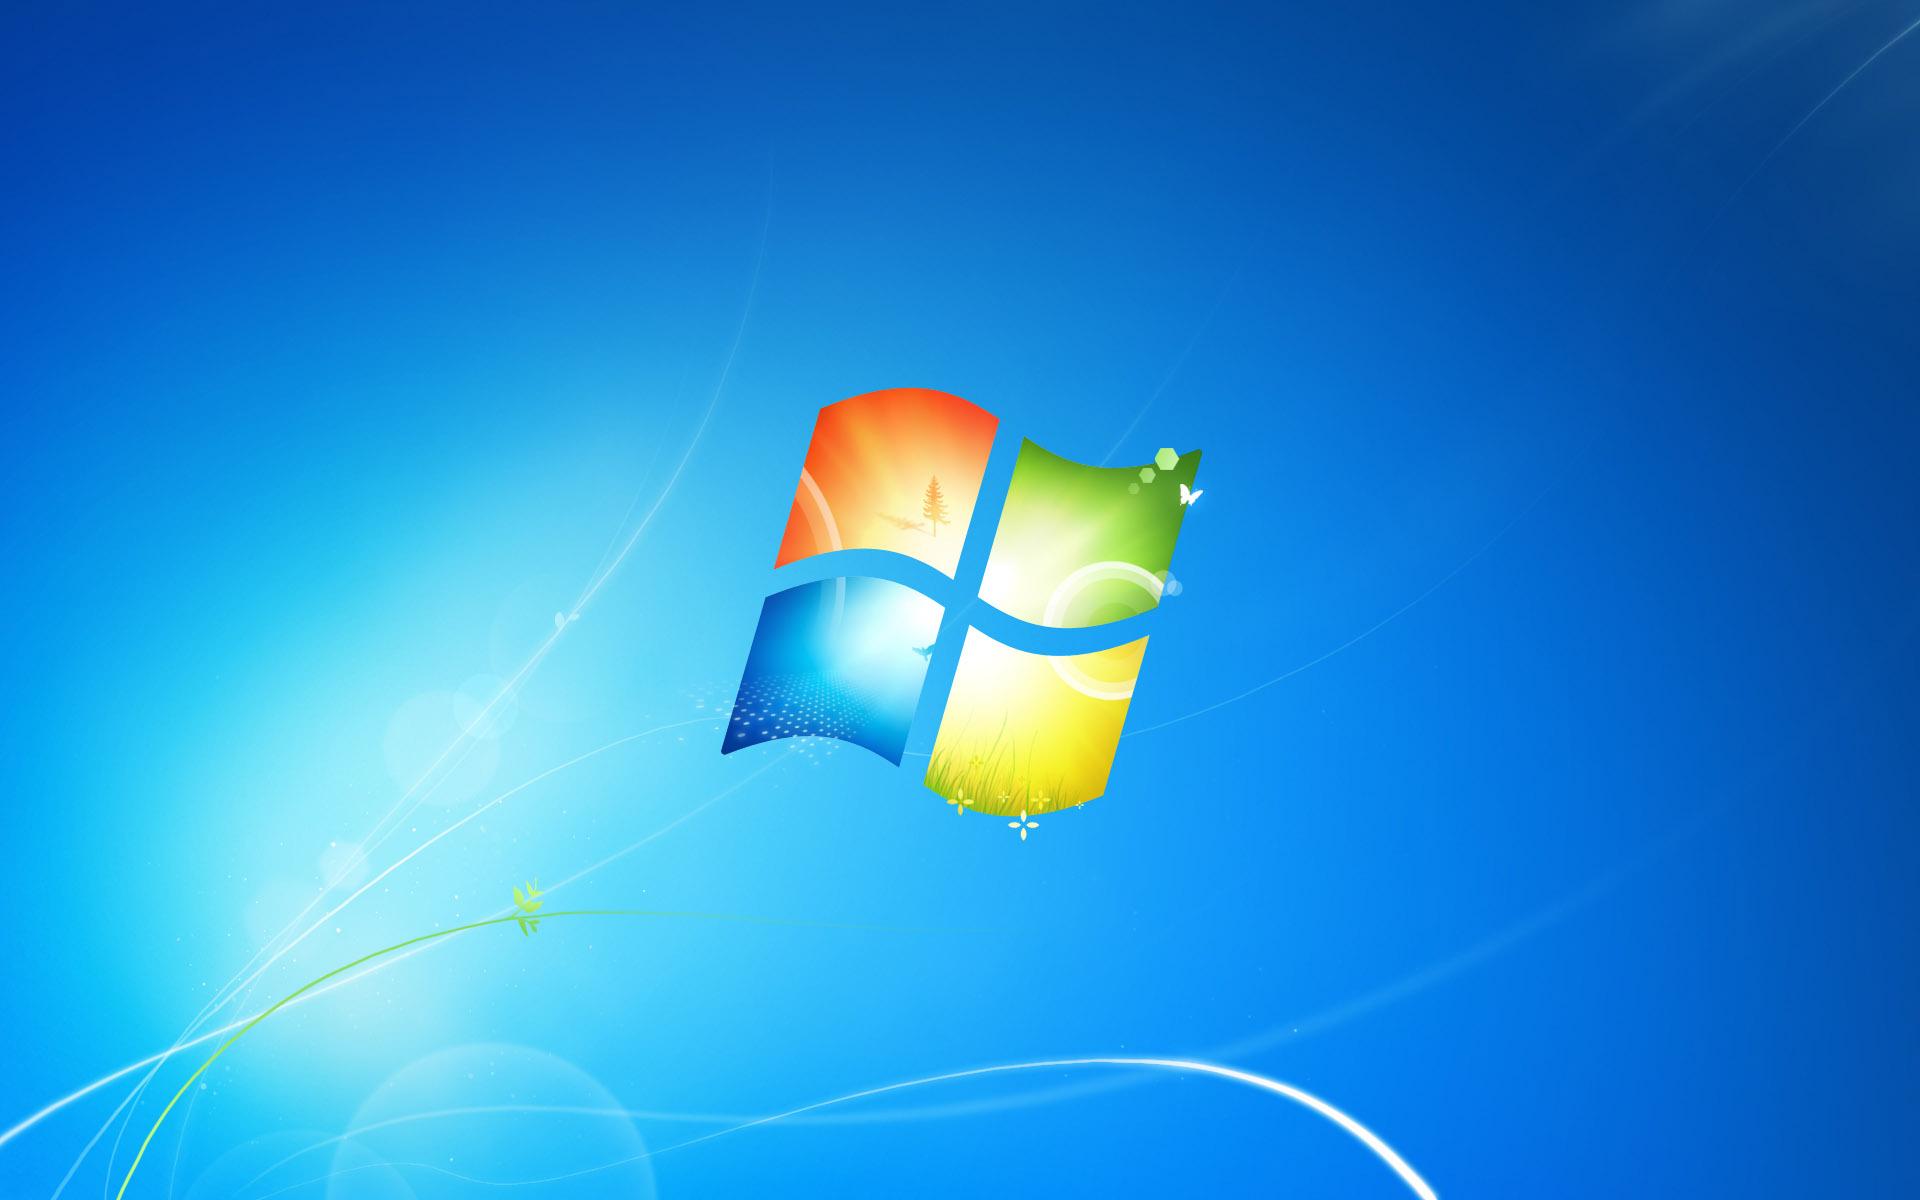 Free Download Windows 7 3d Hd Wallpapers Widescreen Desktop